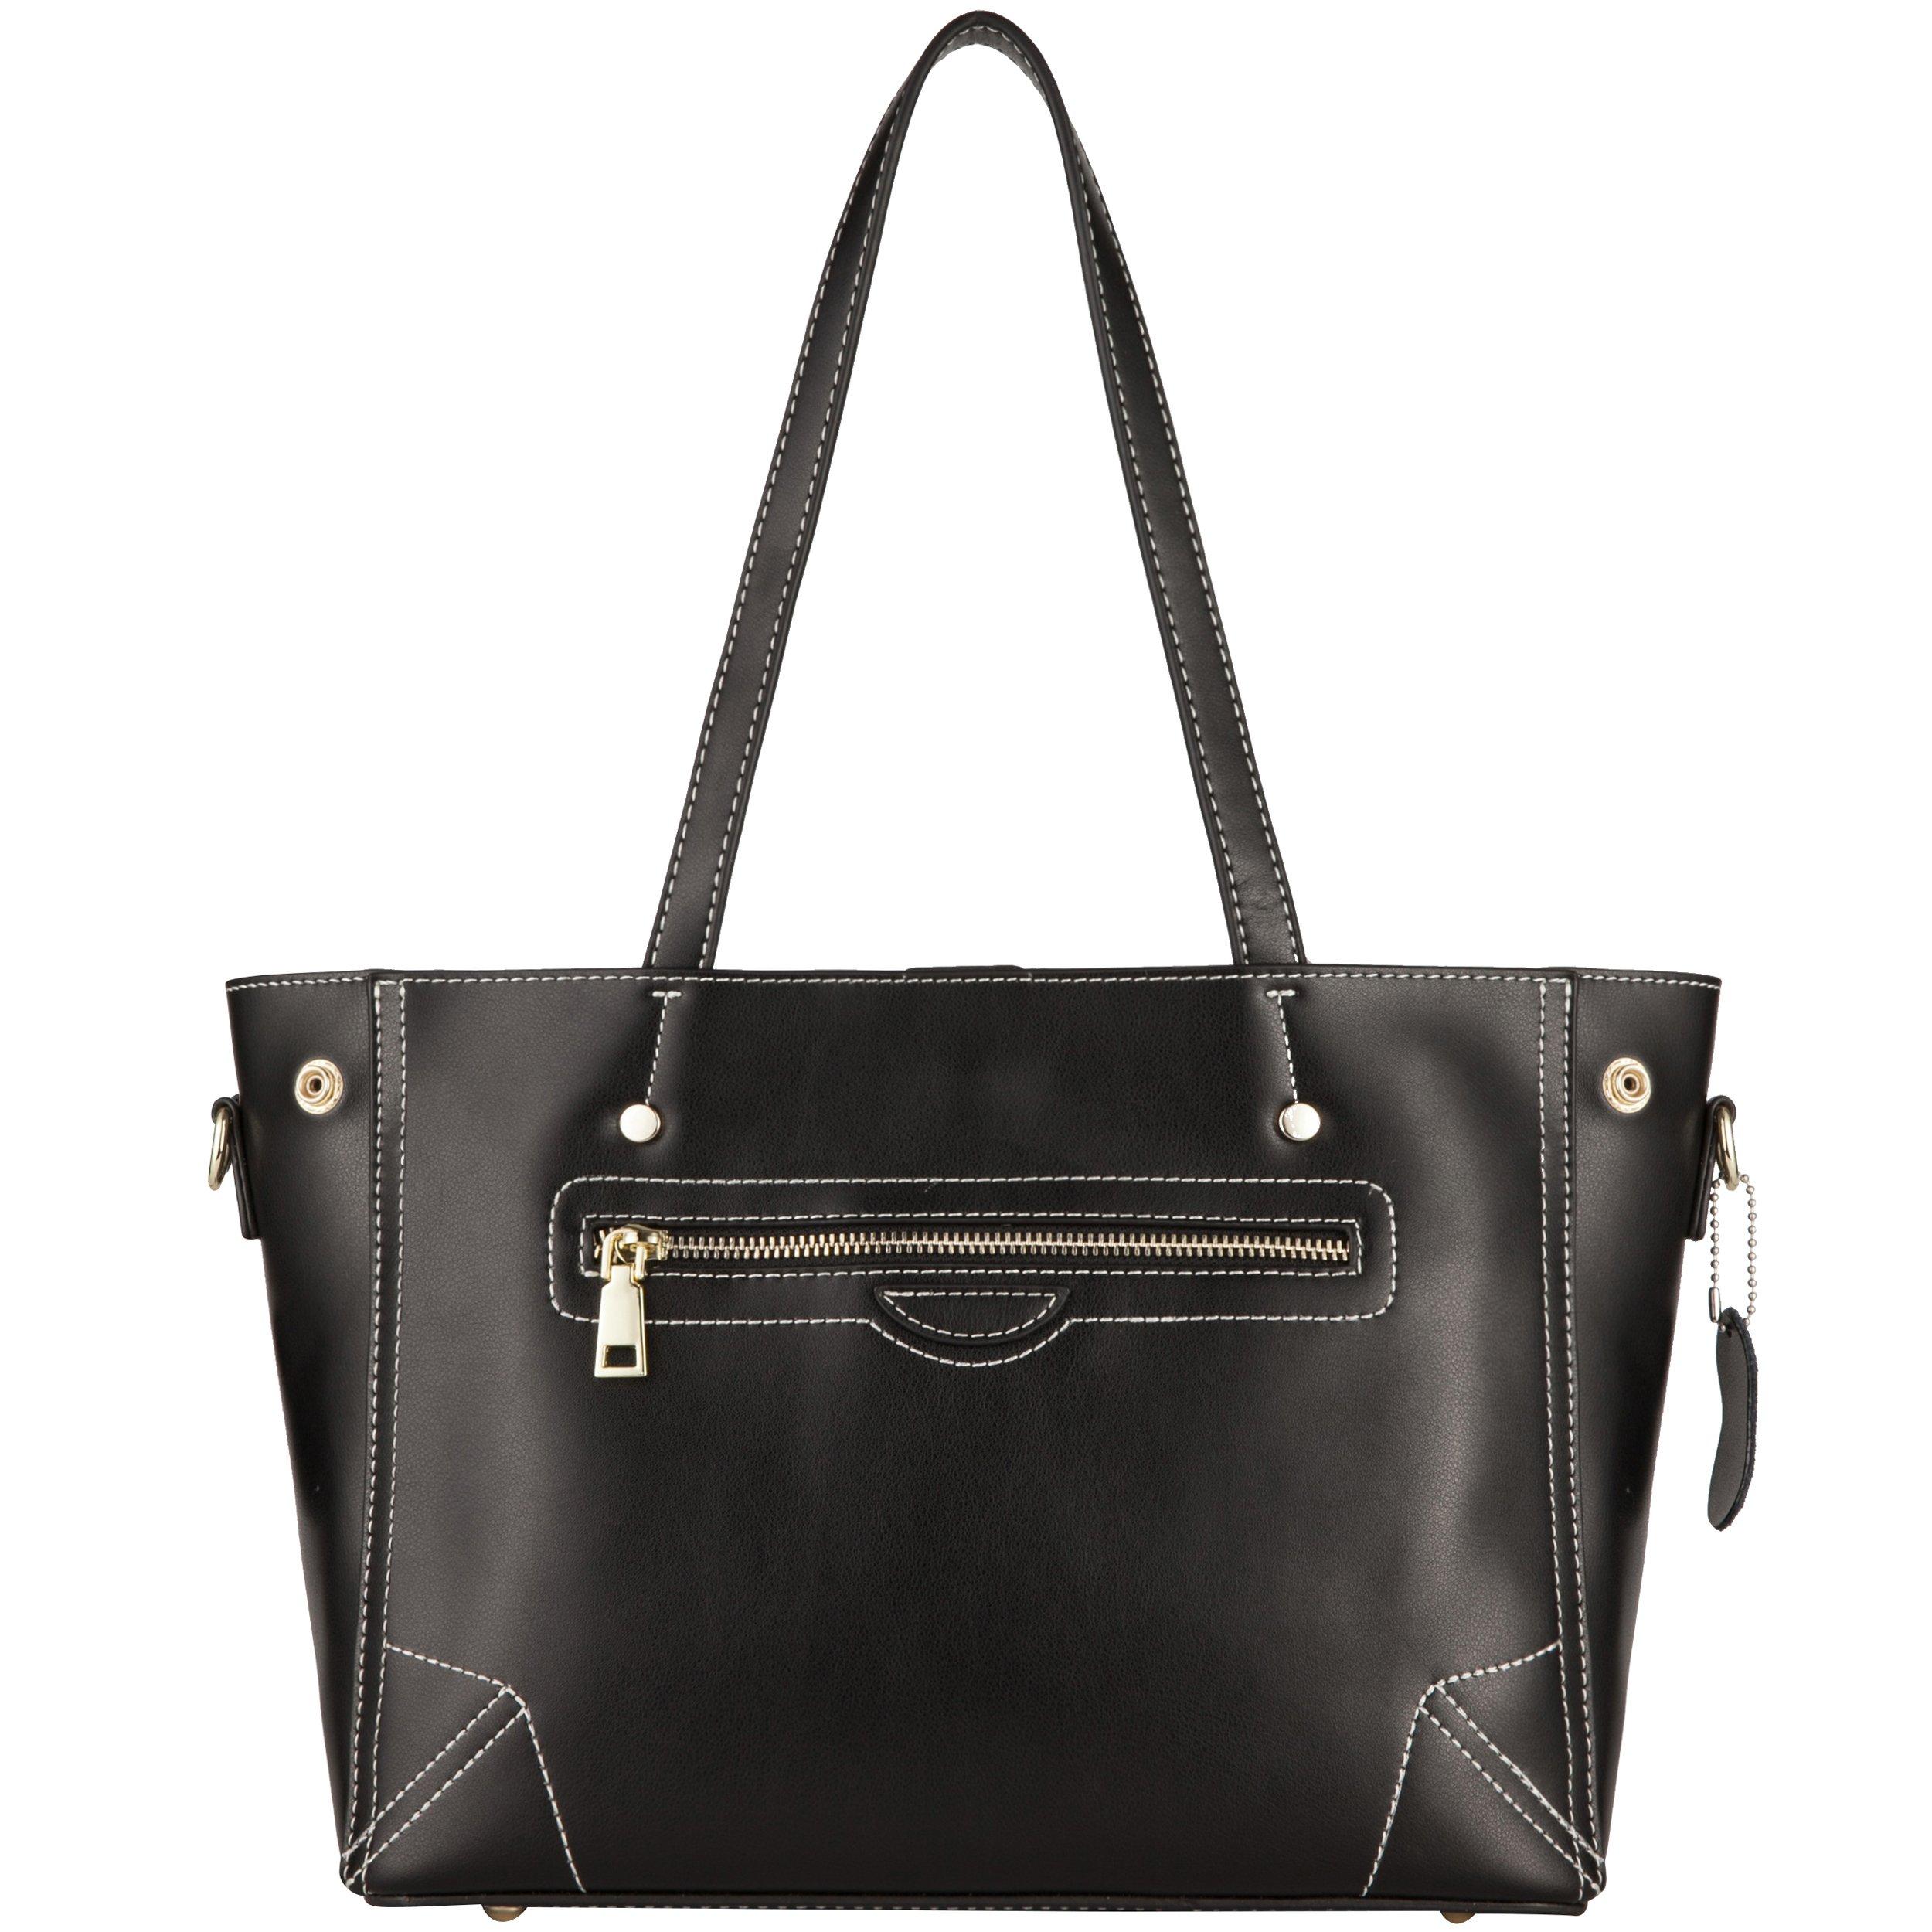 Yiwanda Handbags for Women in Genuine Leather Large Tote Bags Shoulder Bags (Black)